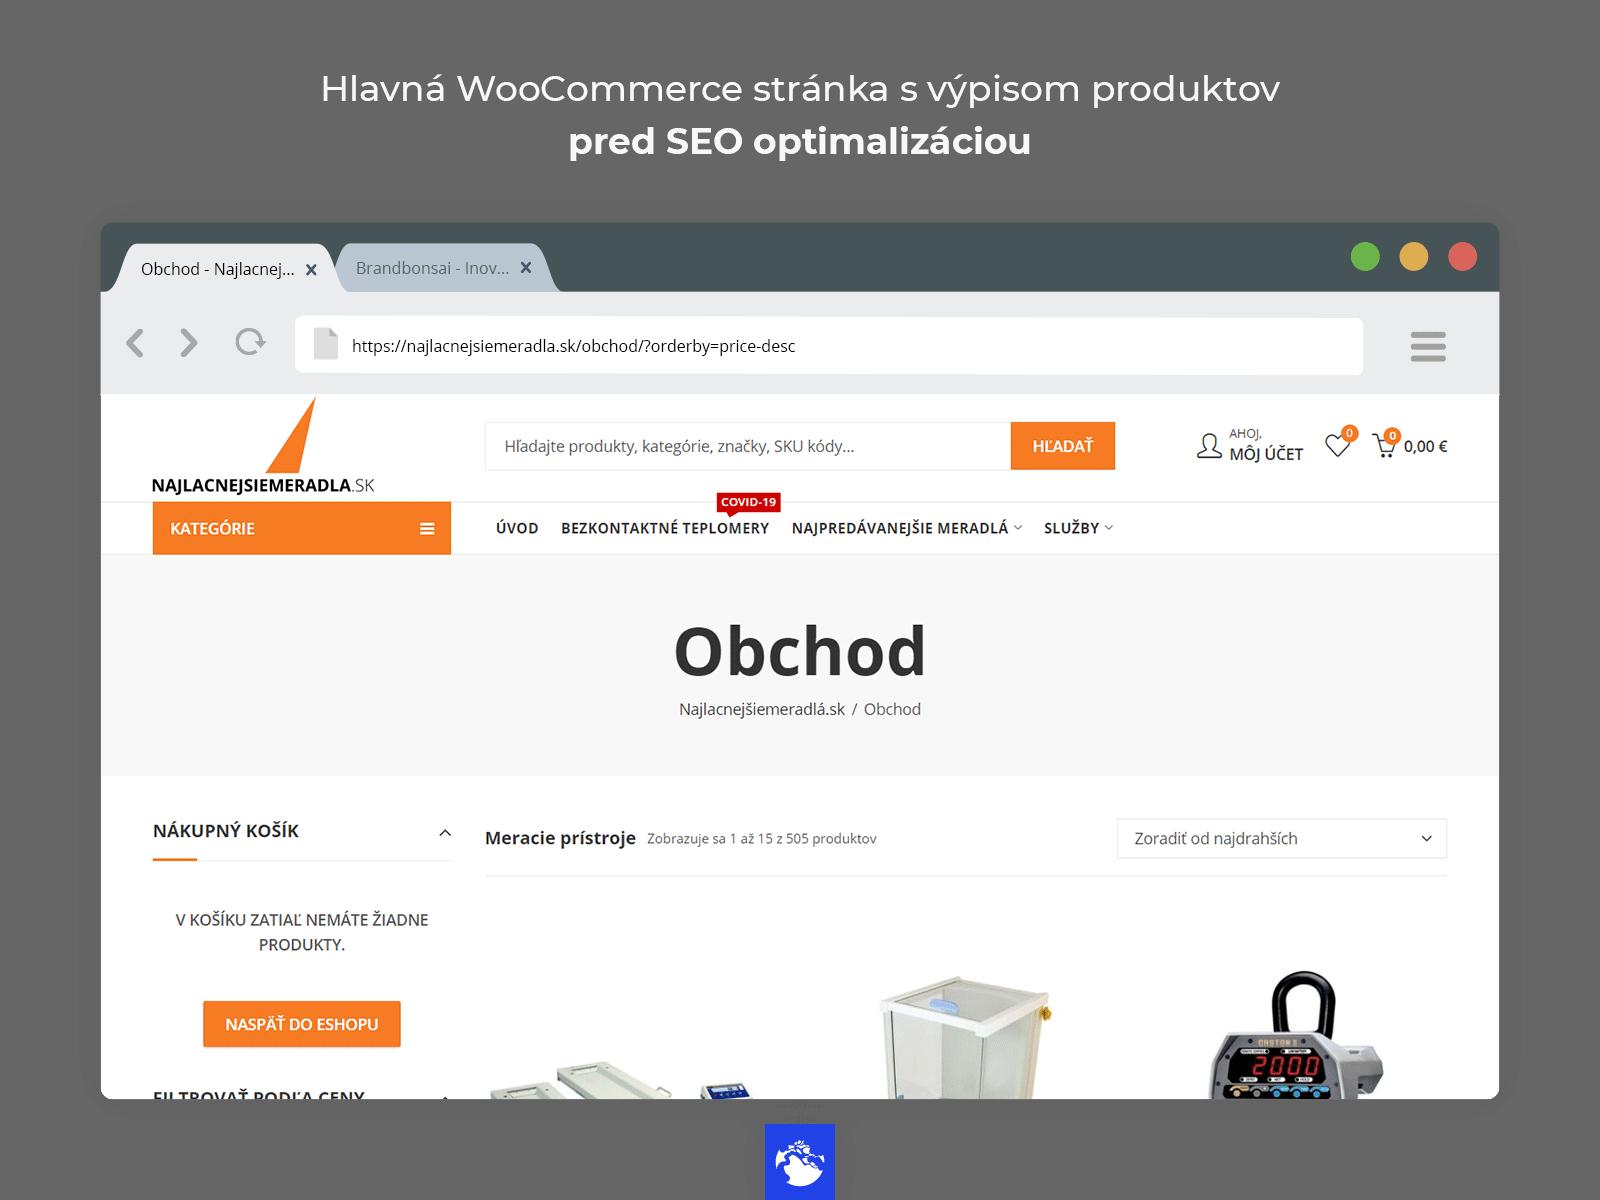 WooCommerce SEO - Pred optimalizáciou obchodu